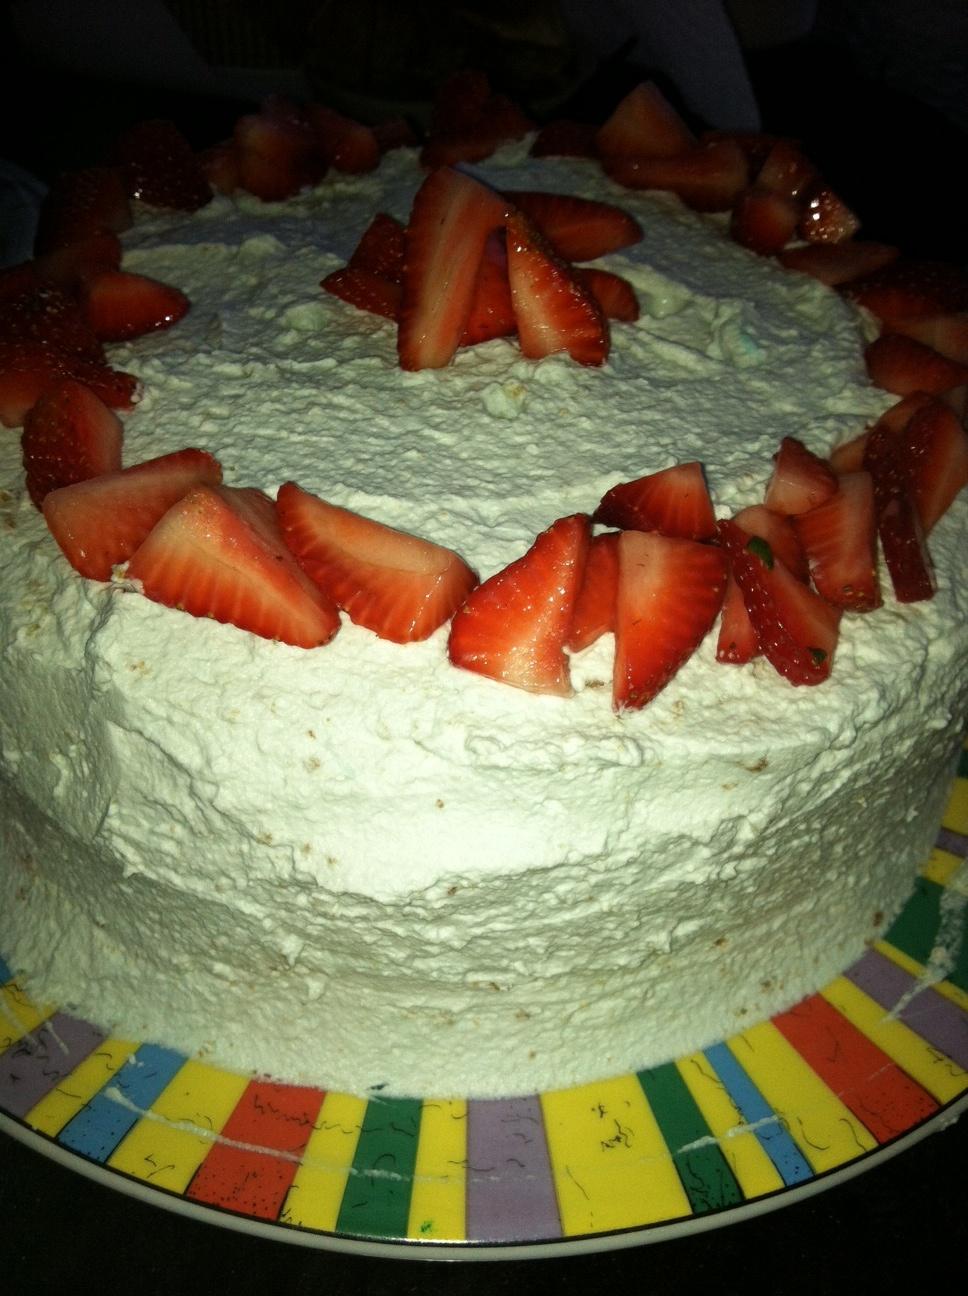 Lemon Poppy Seed Strawberry Cake with Lavender Whipped Cream